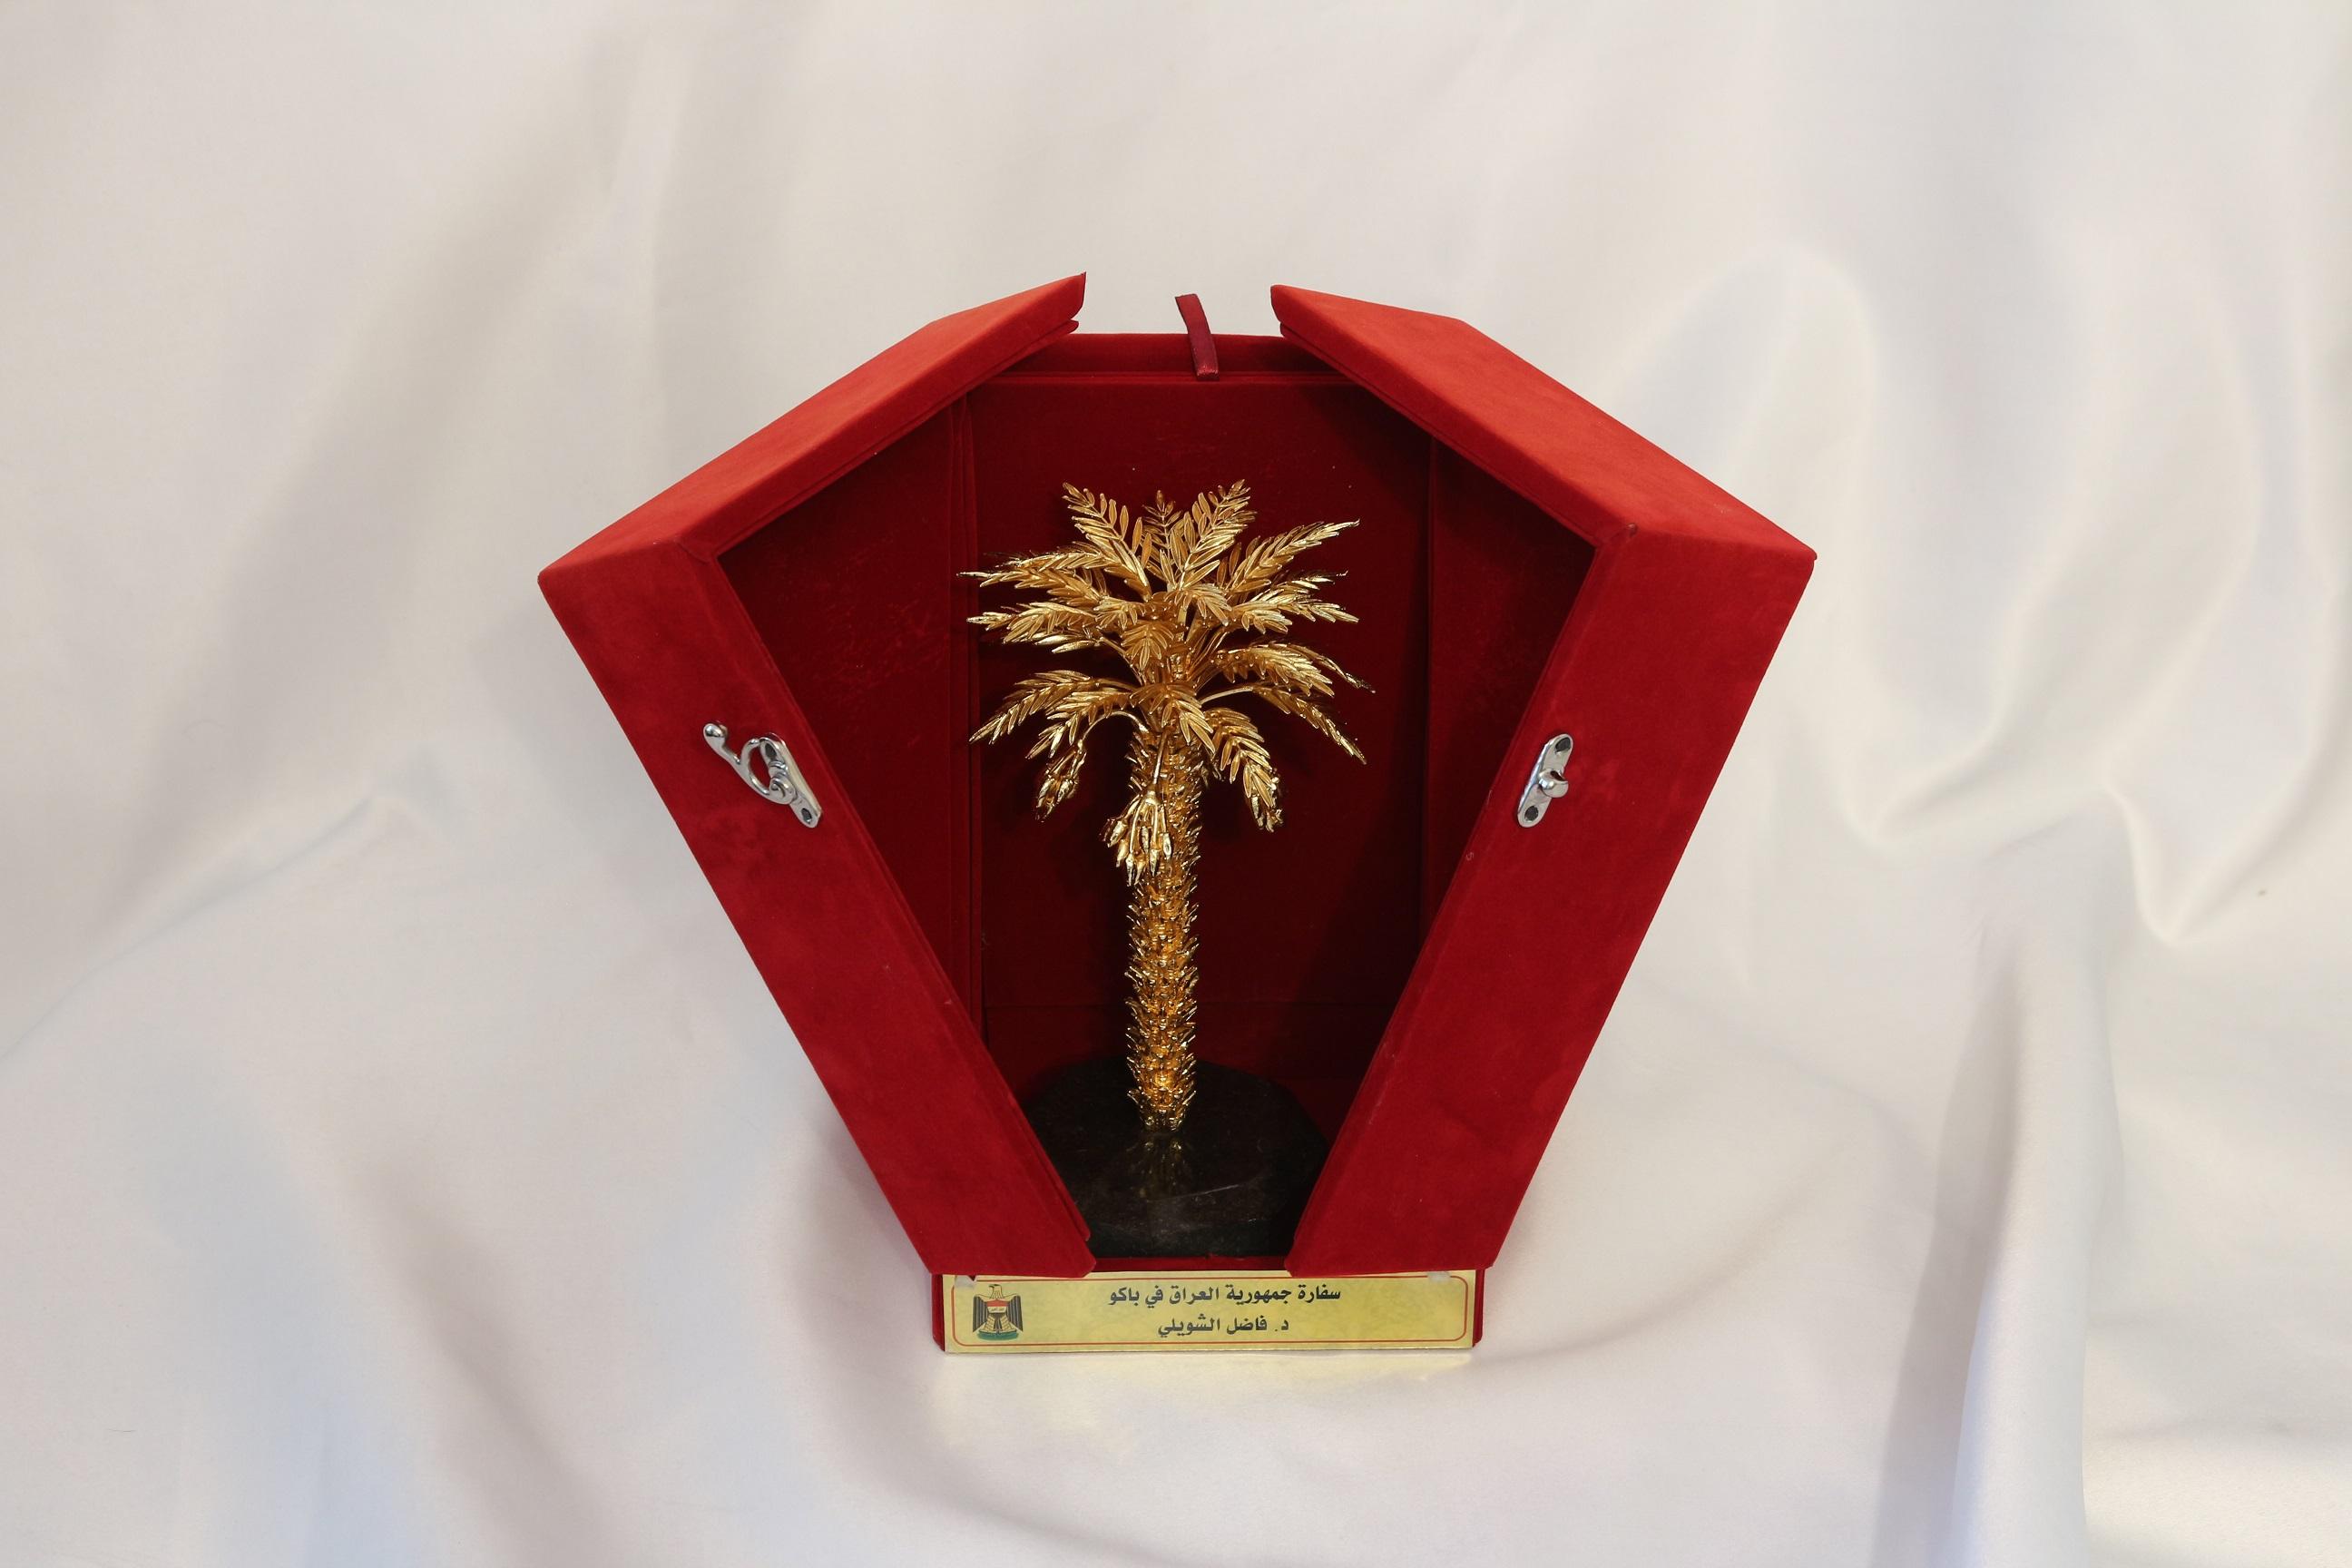 Khazar University Presented Golden Palm Award